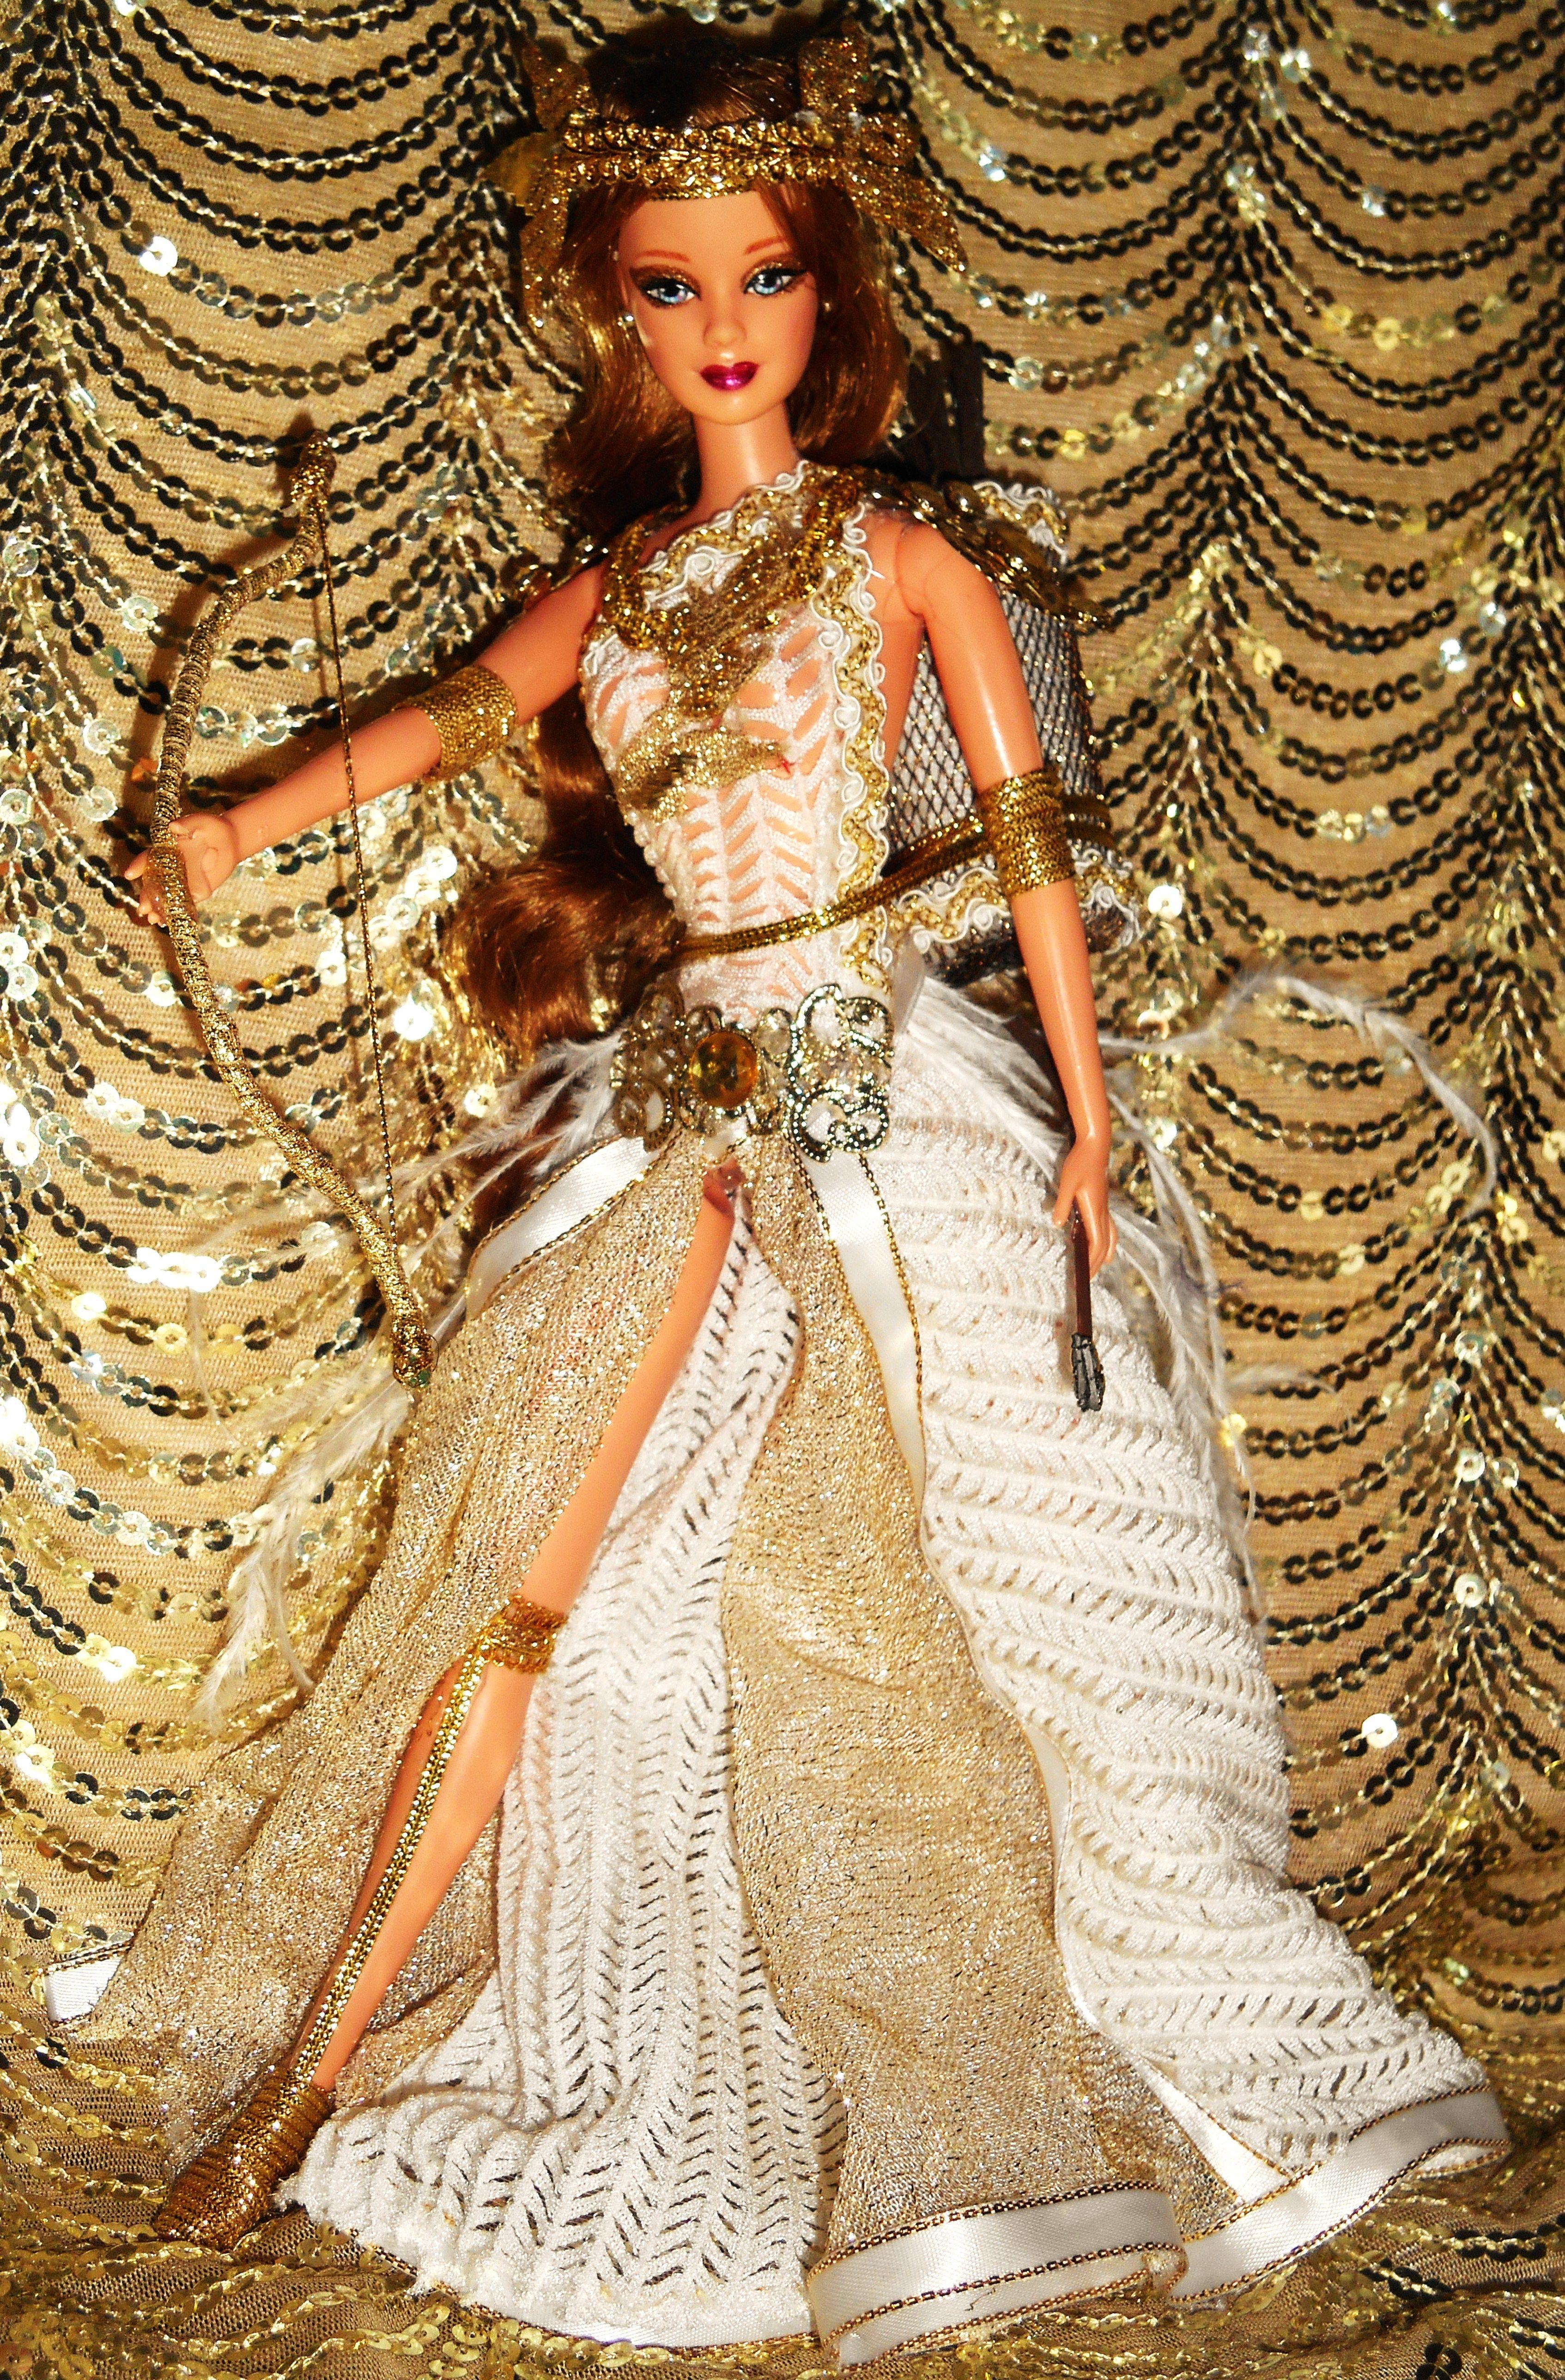 Pin by Dakotas.Song on Dakotas Song Barbie dolls ...